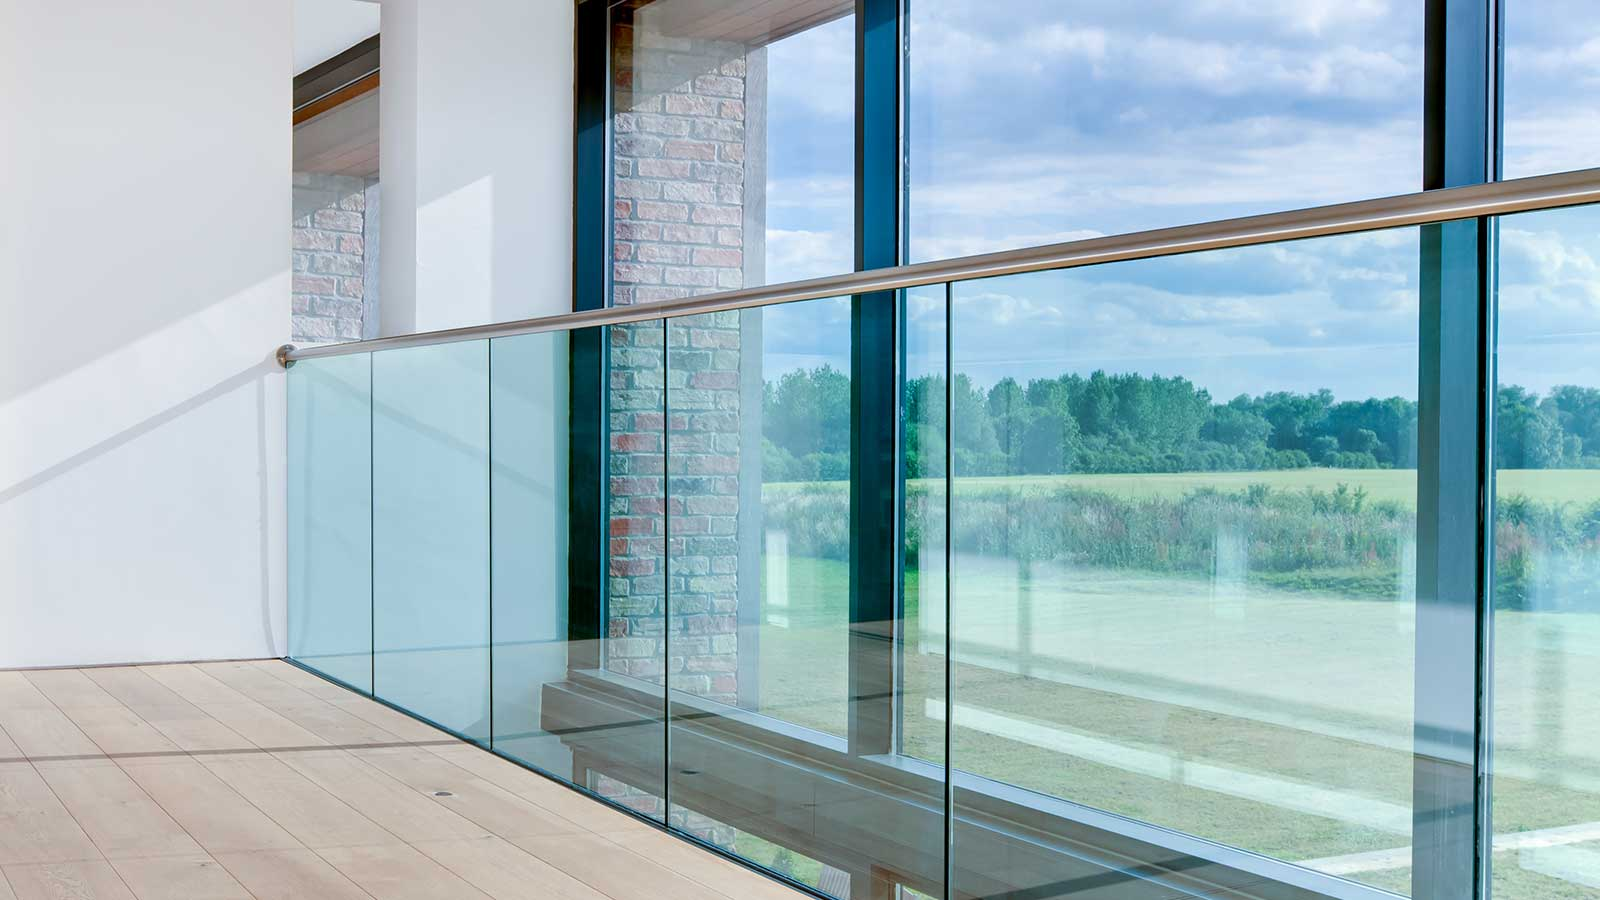 Dubbel Glas Laten Zetten Prijs.Dubbelglas Amsterdam Scherpste Qua Prijs En Plaatsing